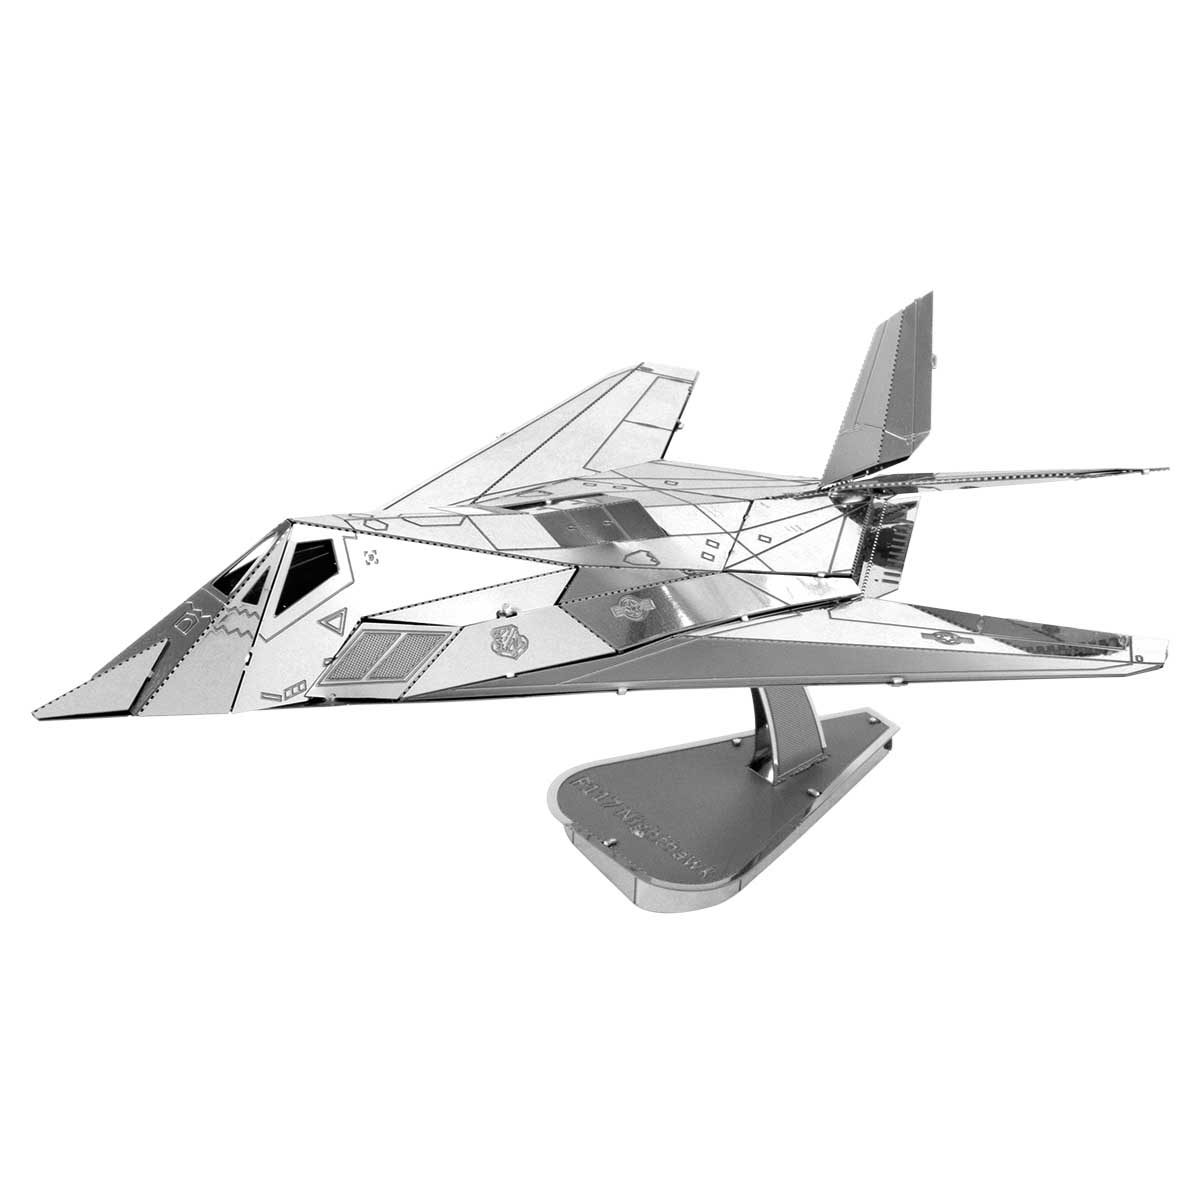 F-117 Nighthawk Planes Metal Puzzles